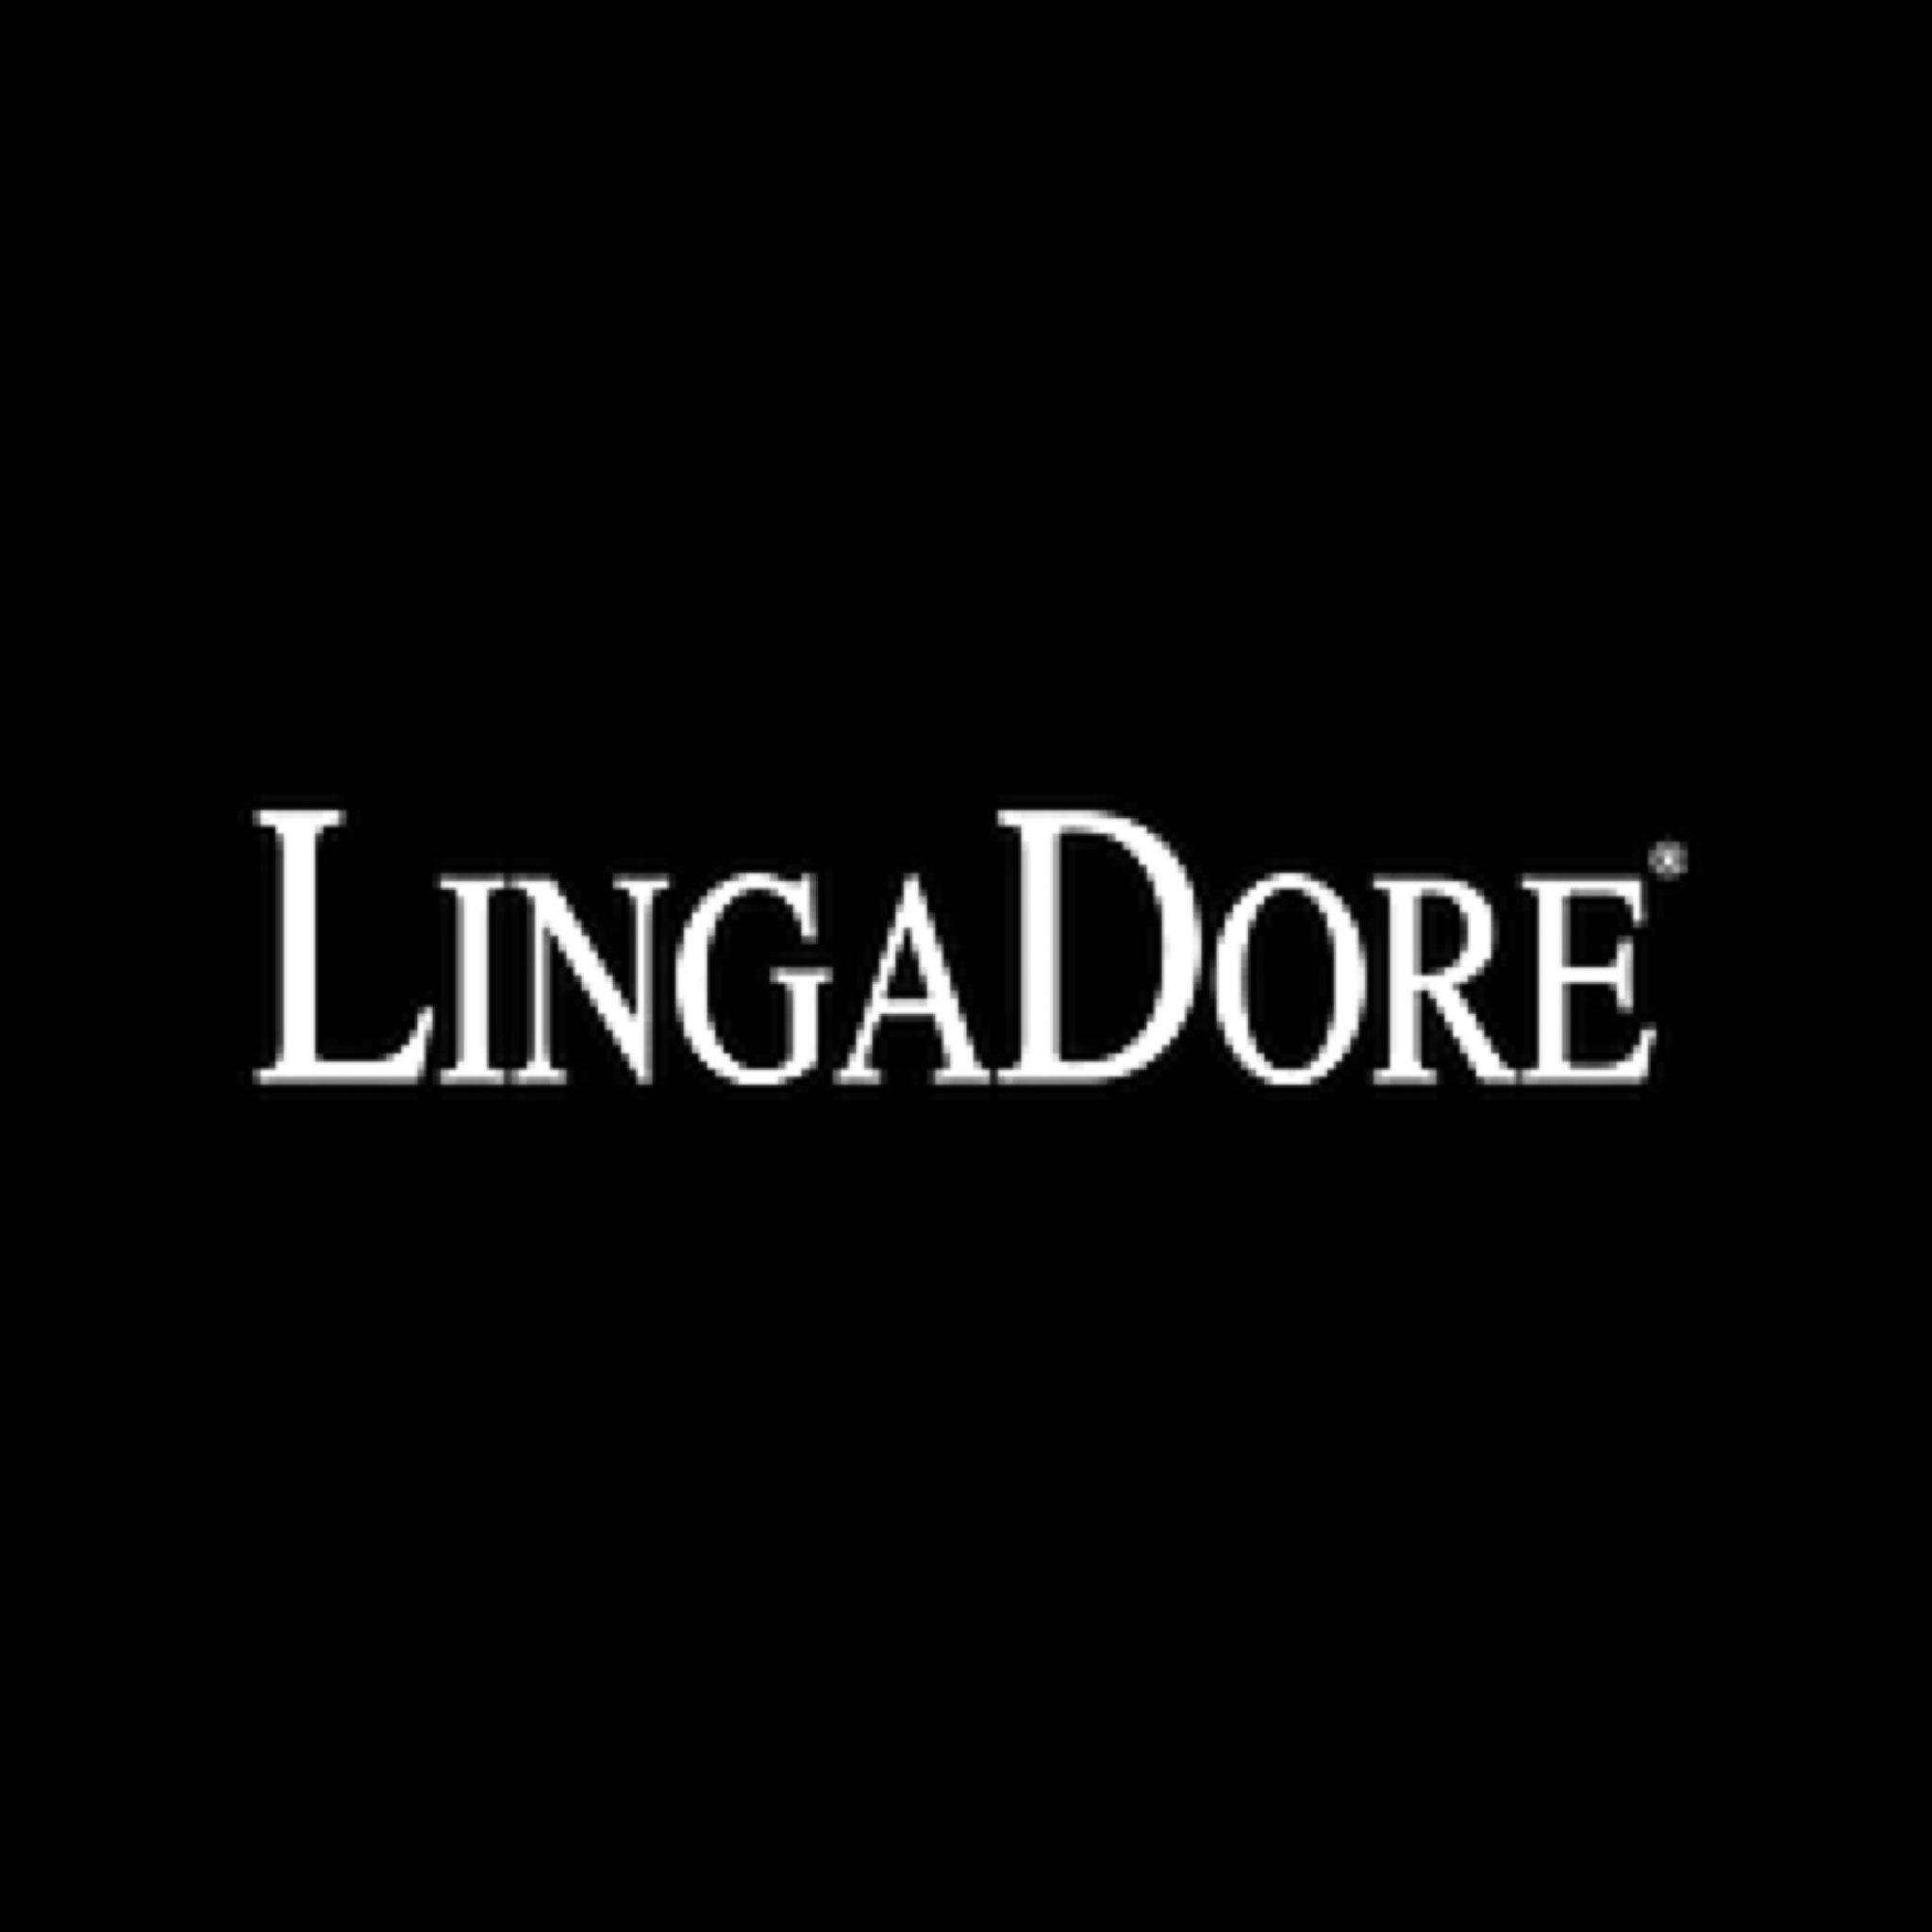 lingadore-2048x2048